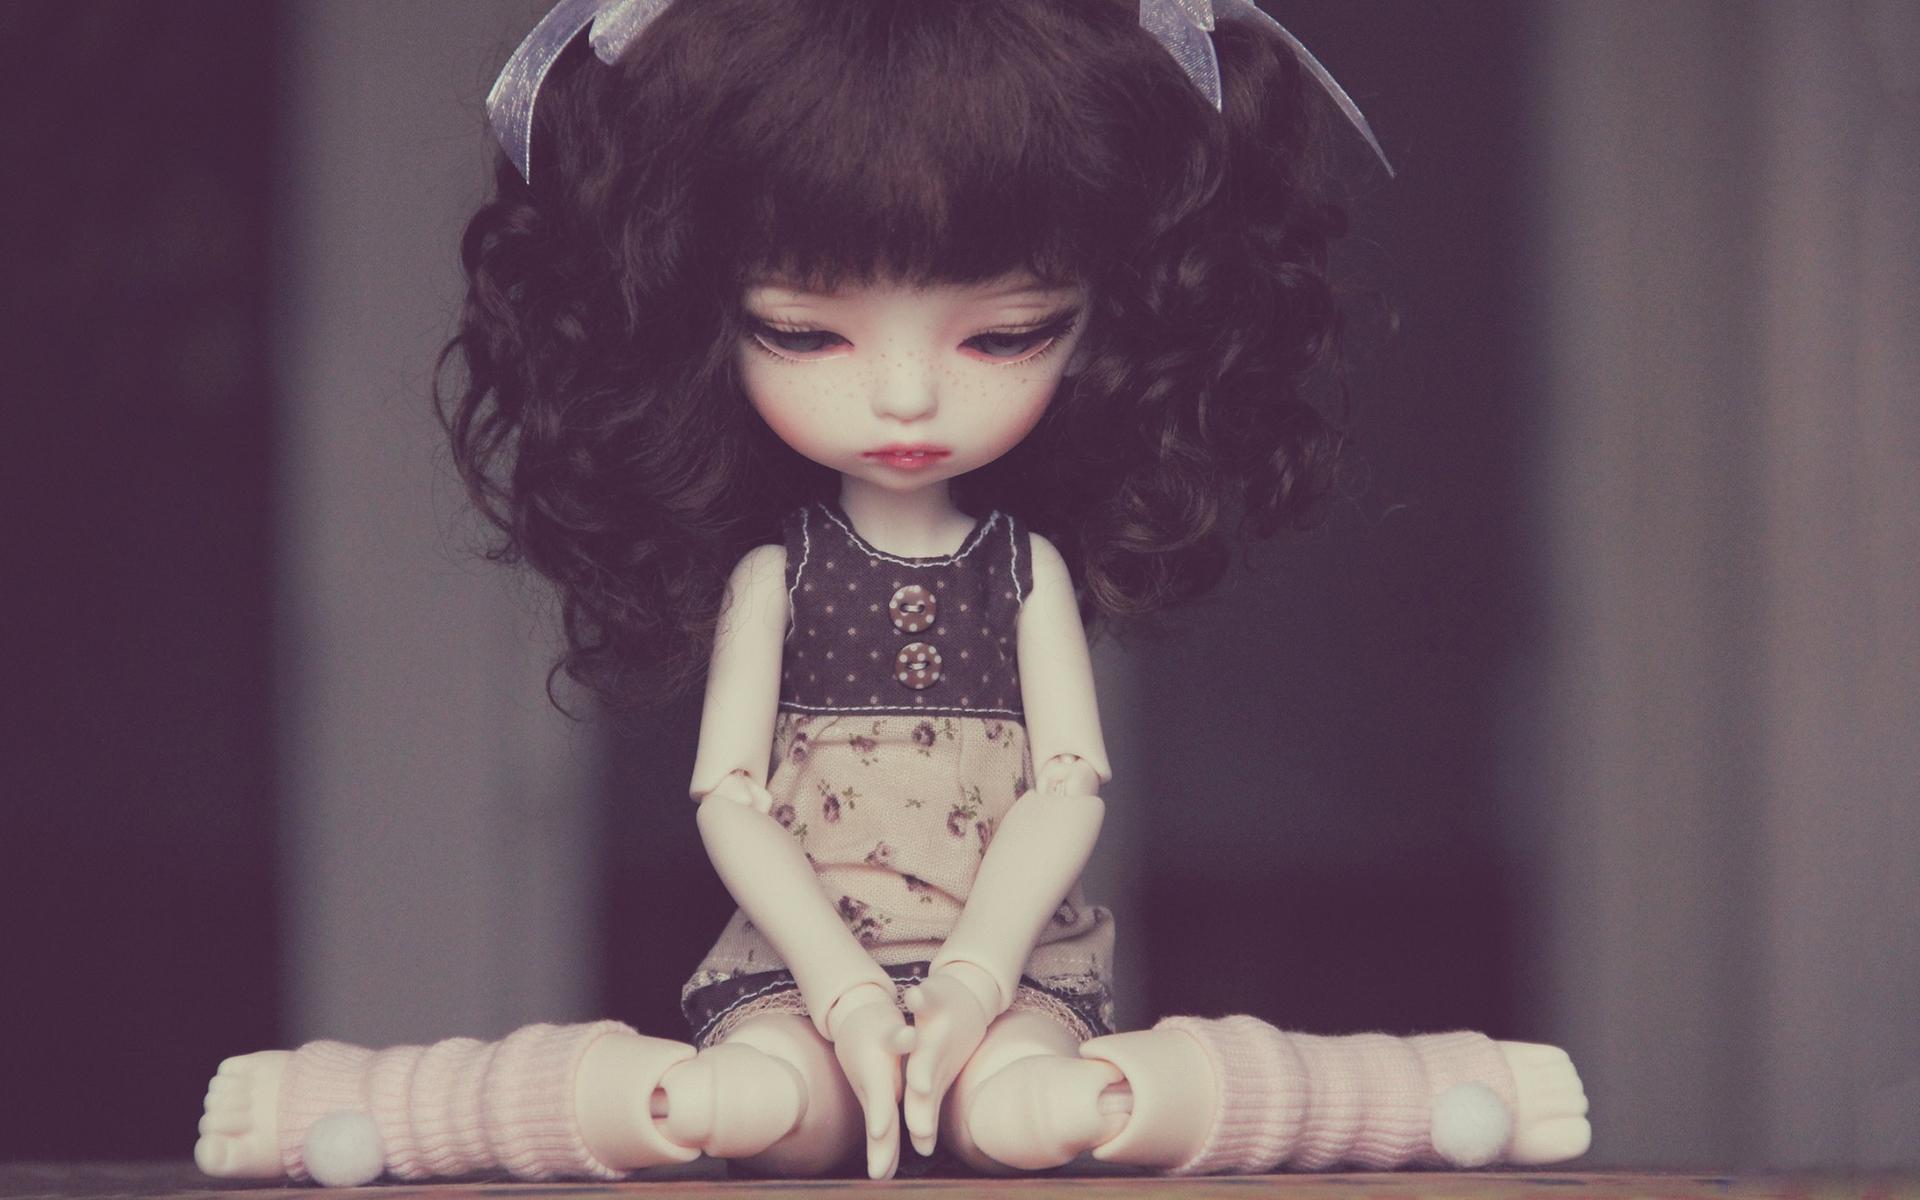 Sad doll sitting